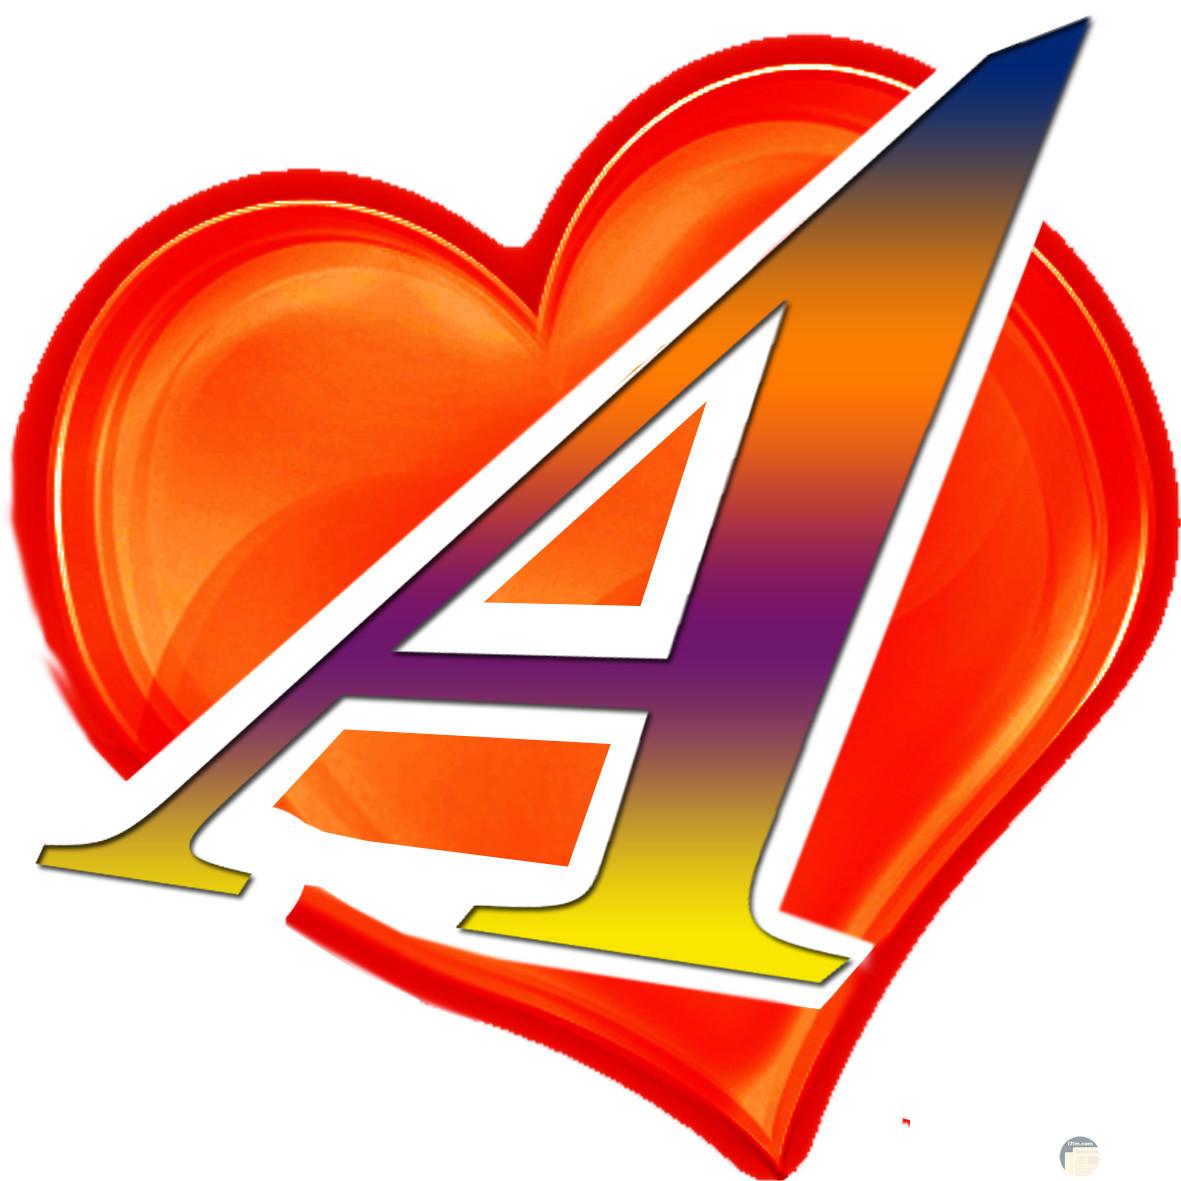 حرف A داخل قلب أحمر